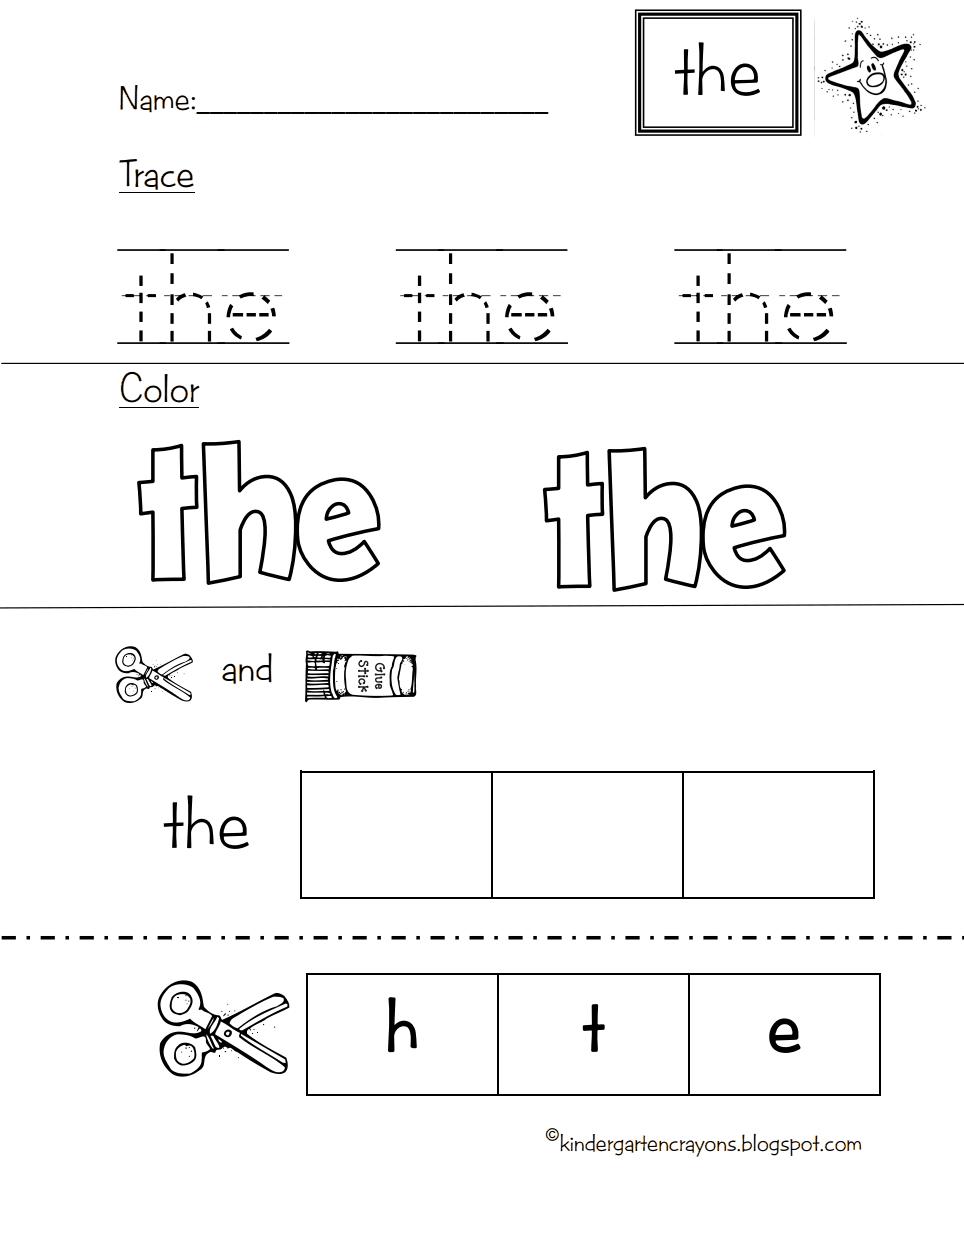 Star Word The Pdf Google Drive Sight Words Kindergarten Preschool Sight Words Kindergarten Crayons